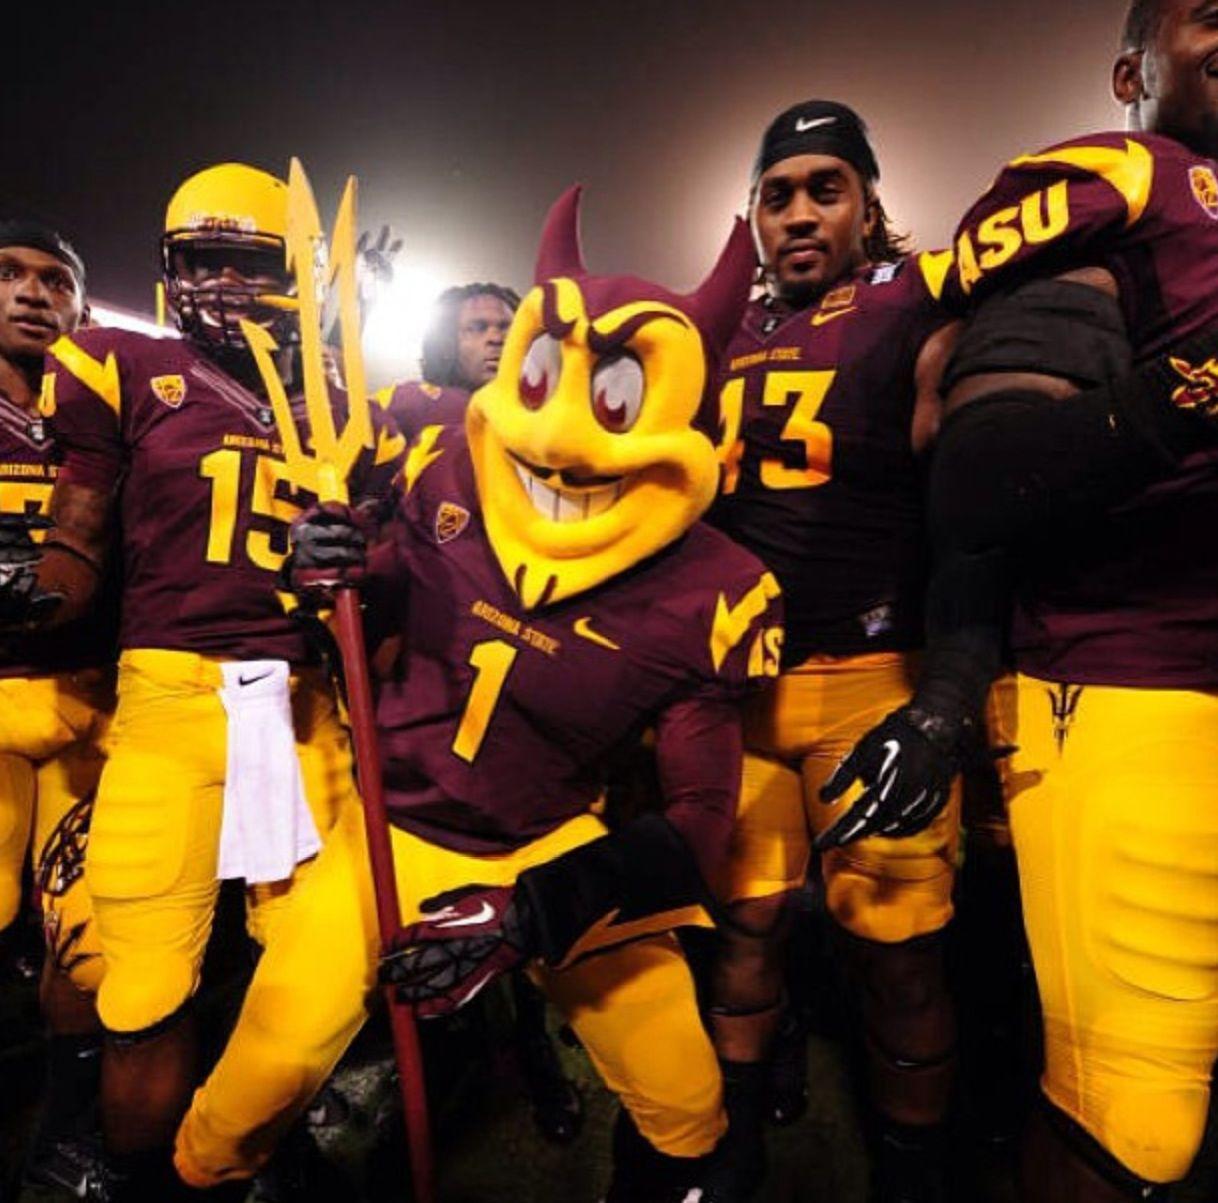 Sparky And His Sun Devils Asu Football Arizona State University